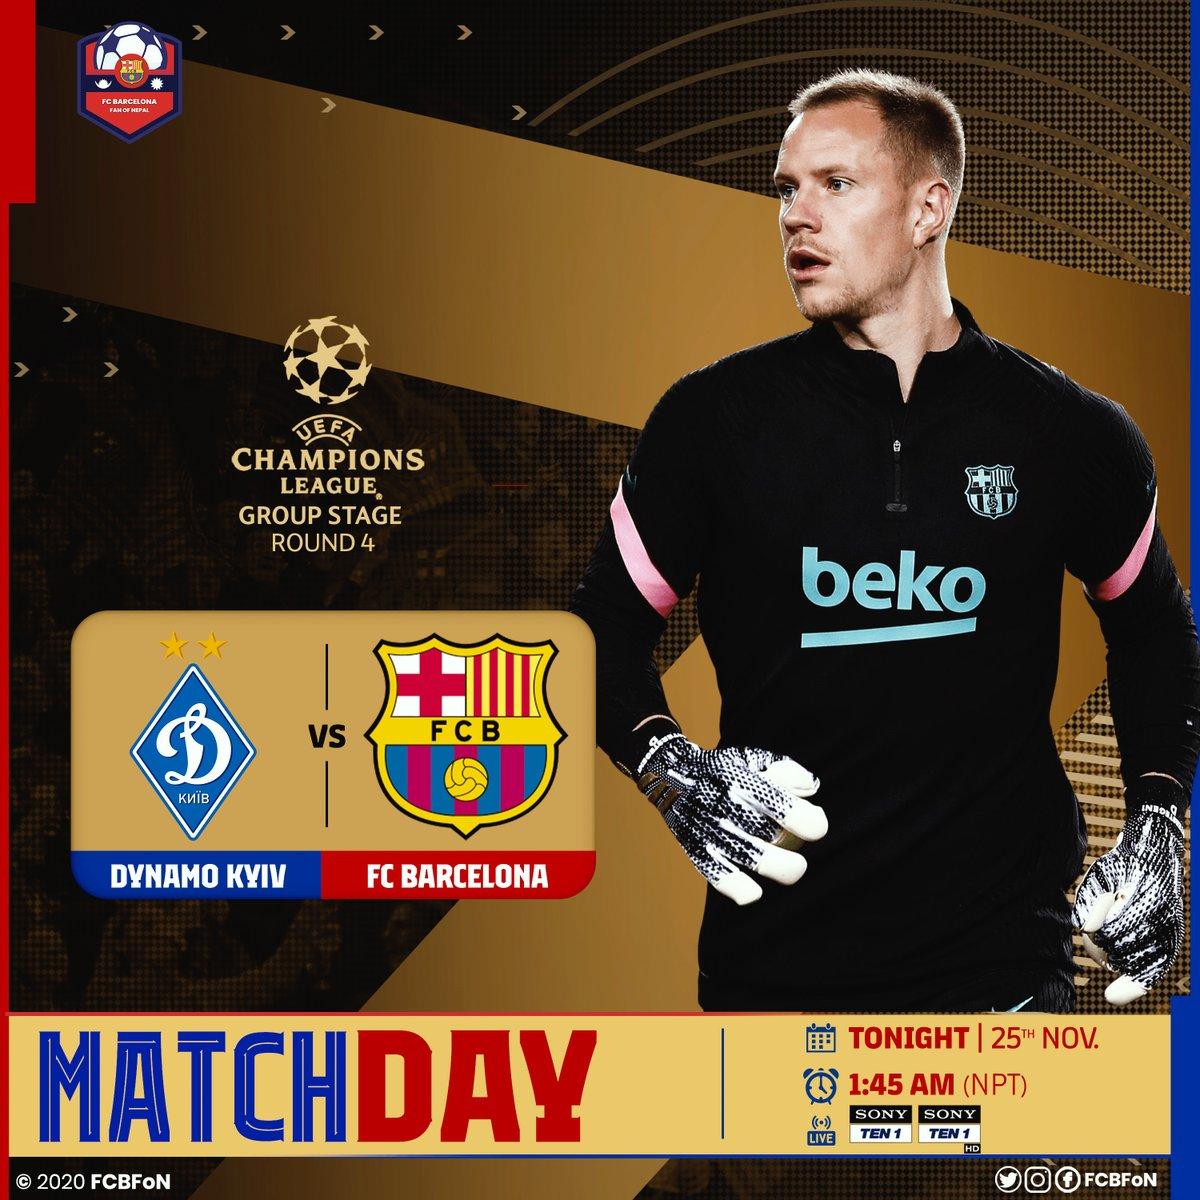 Champions League is 🔙💙❤  #MATCHDAY #KyivBarca #UCL #FCBFoN https://t.co/7Ri2Chkh1x